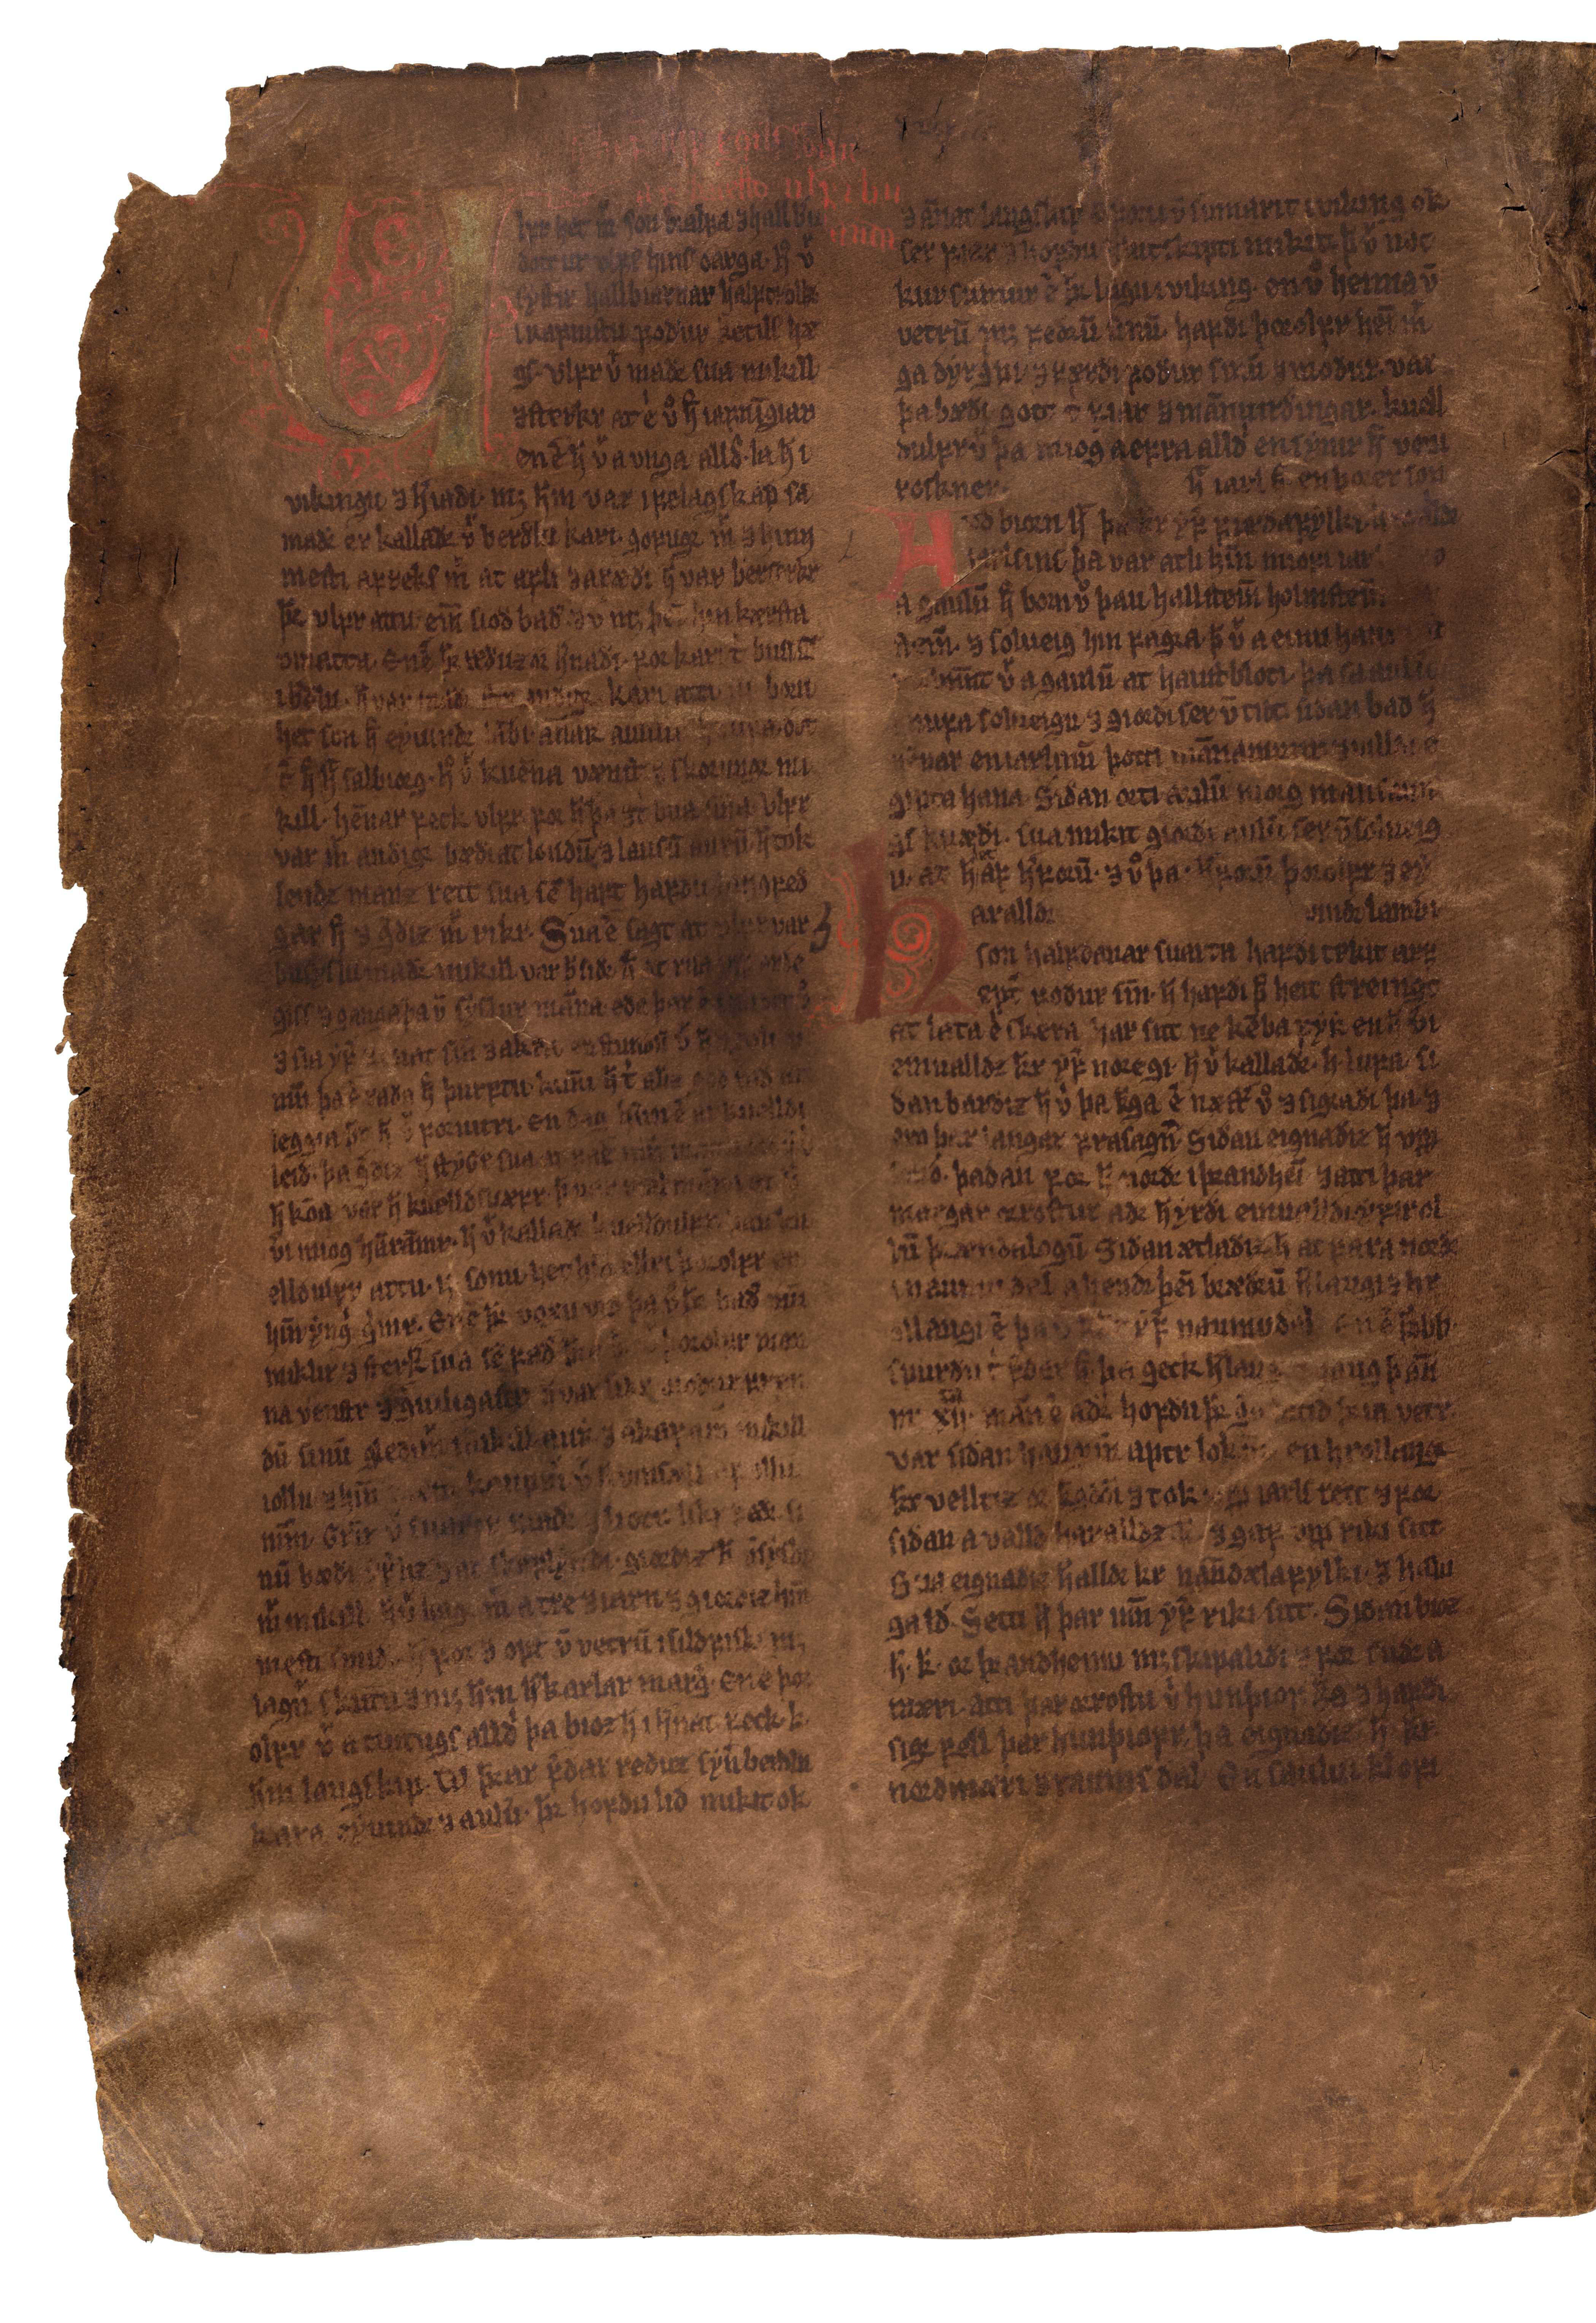 AM 132 fol - 62v